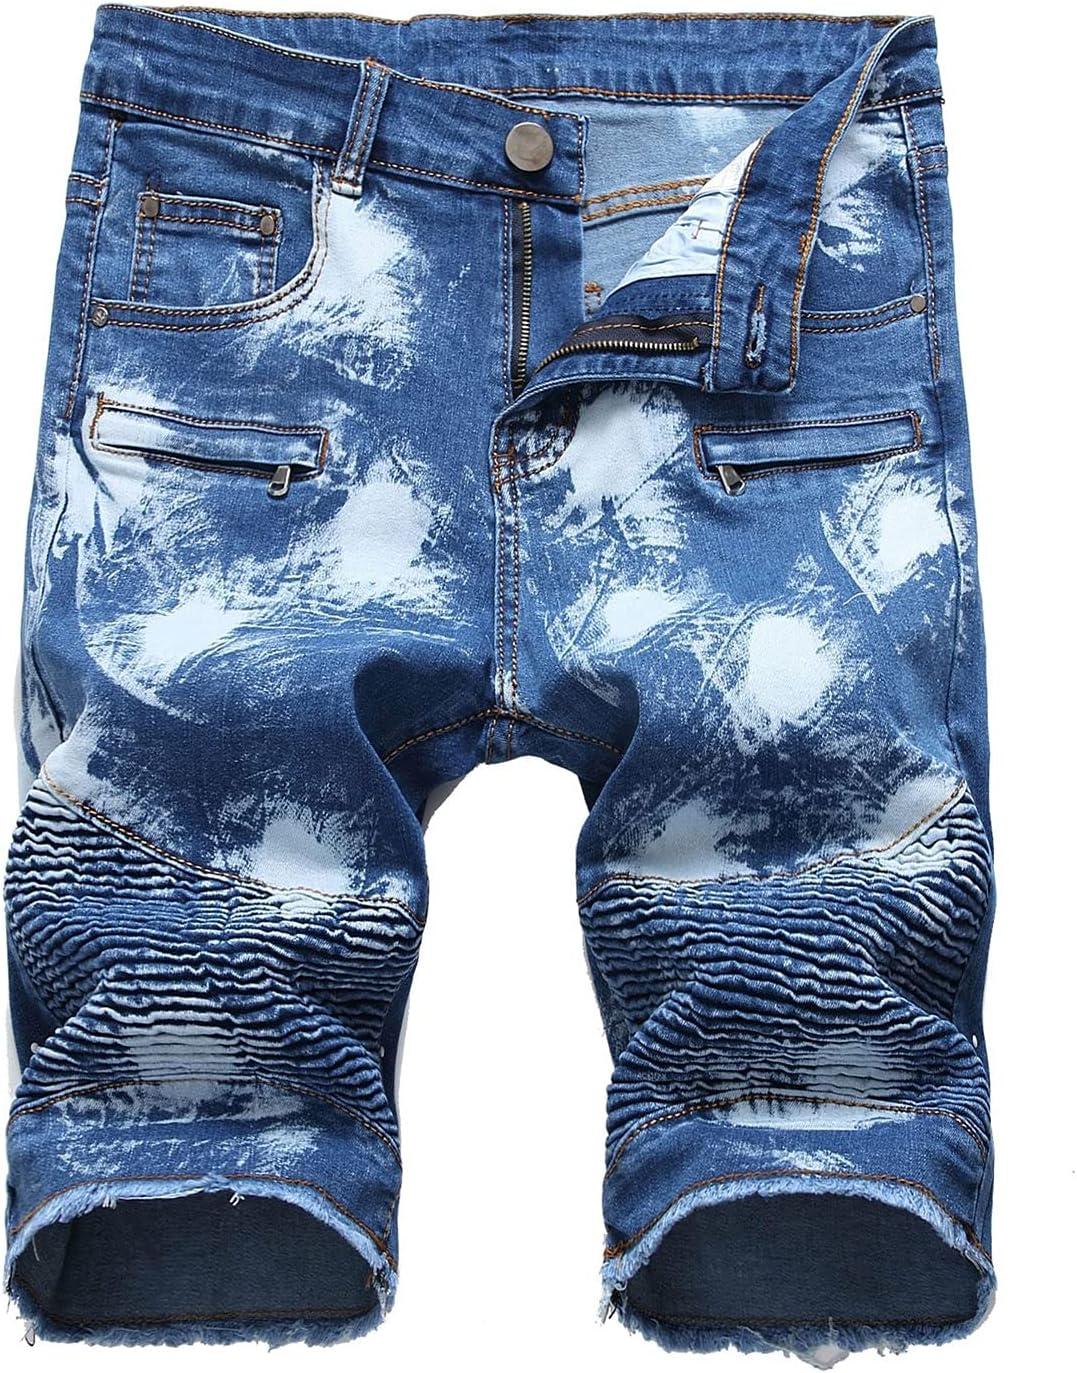 Men's Slim Folds Ripped Jeans Short Straight Fit Zipper Decoration Denim Short-pant Casual Biker Distressed Shorts Jean (Blue 1,30)